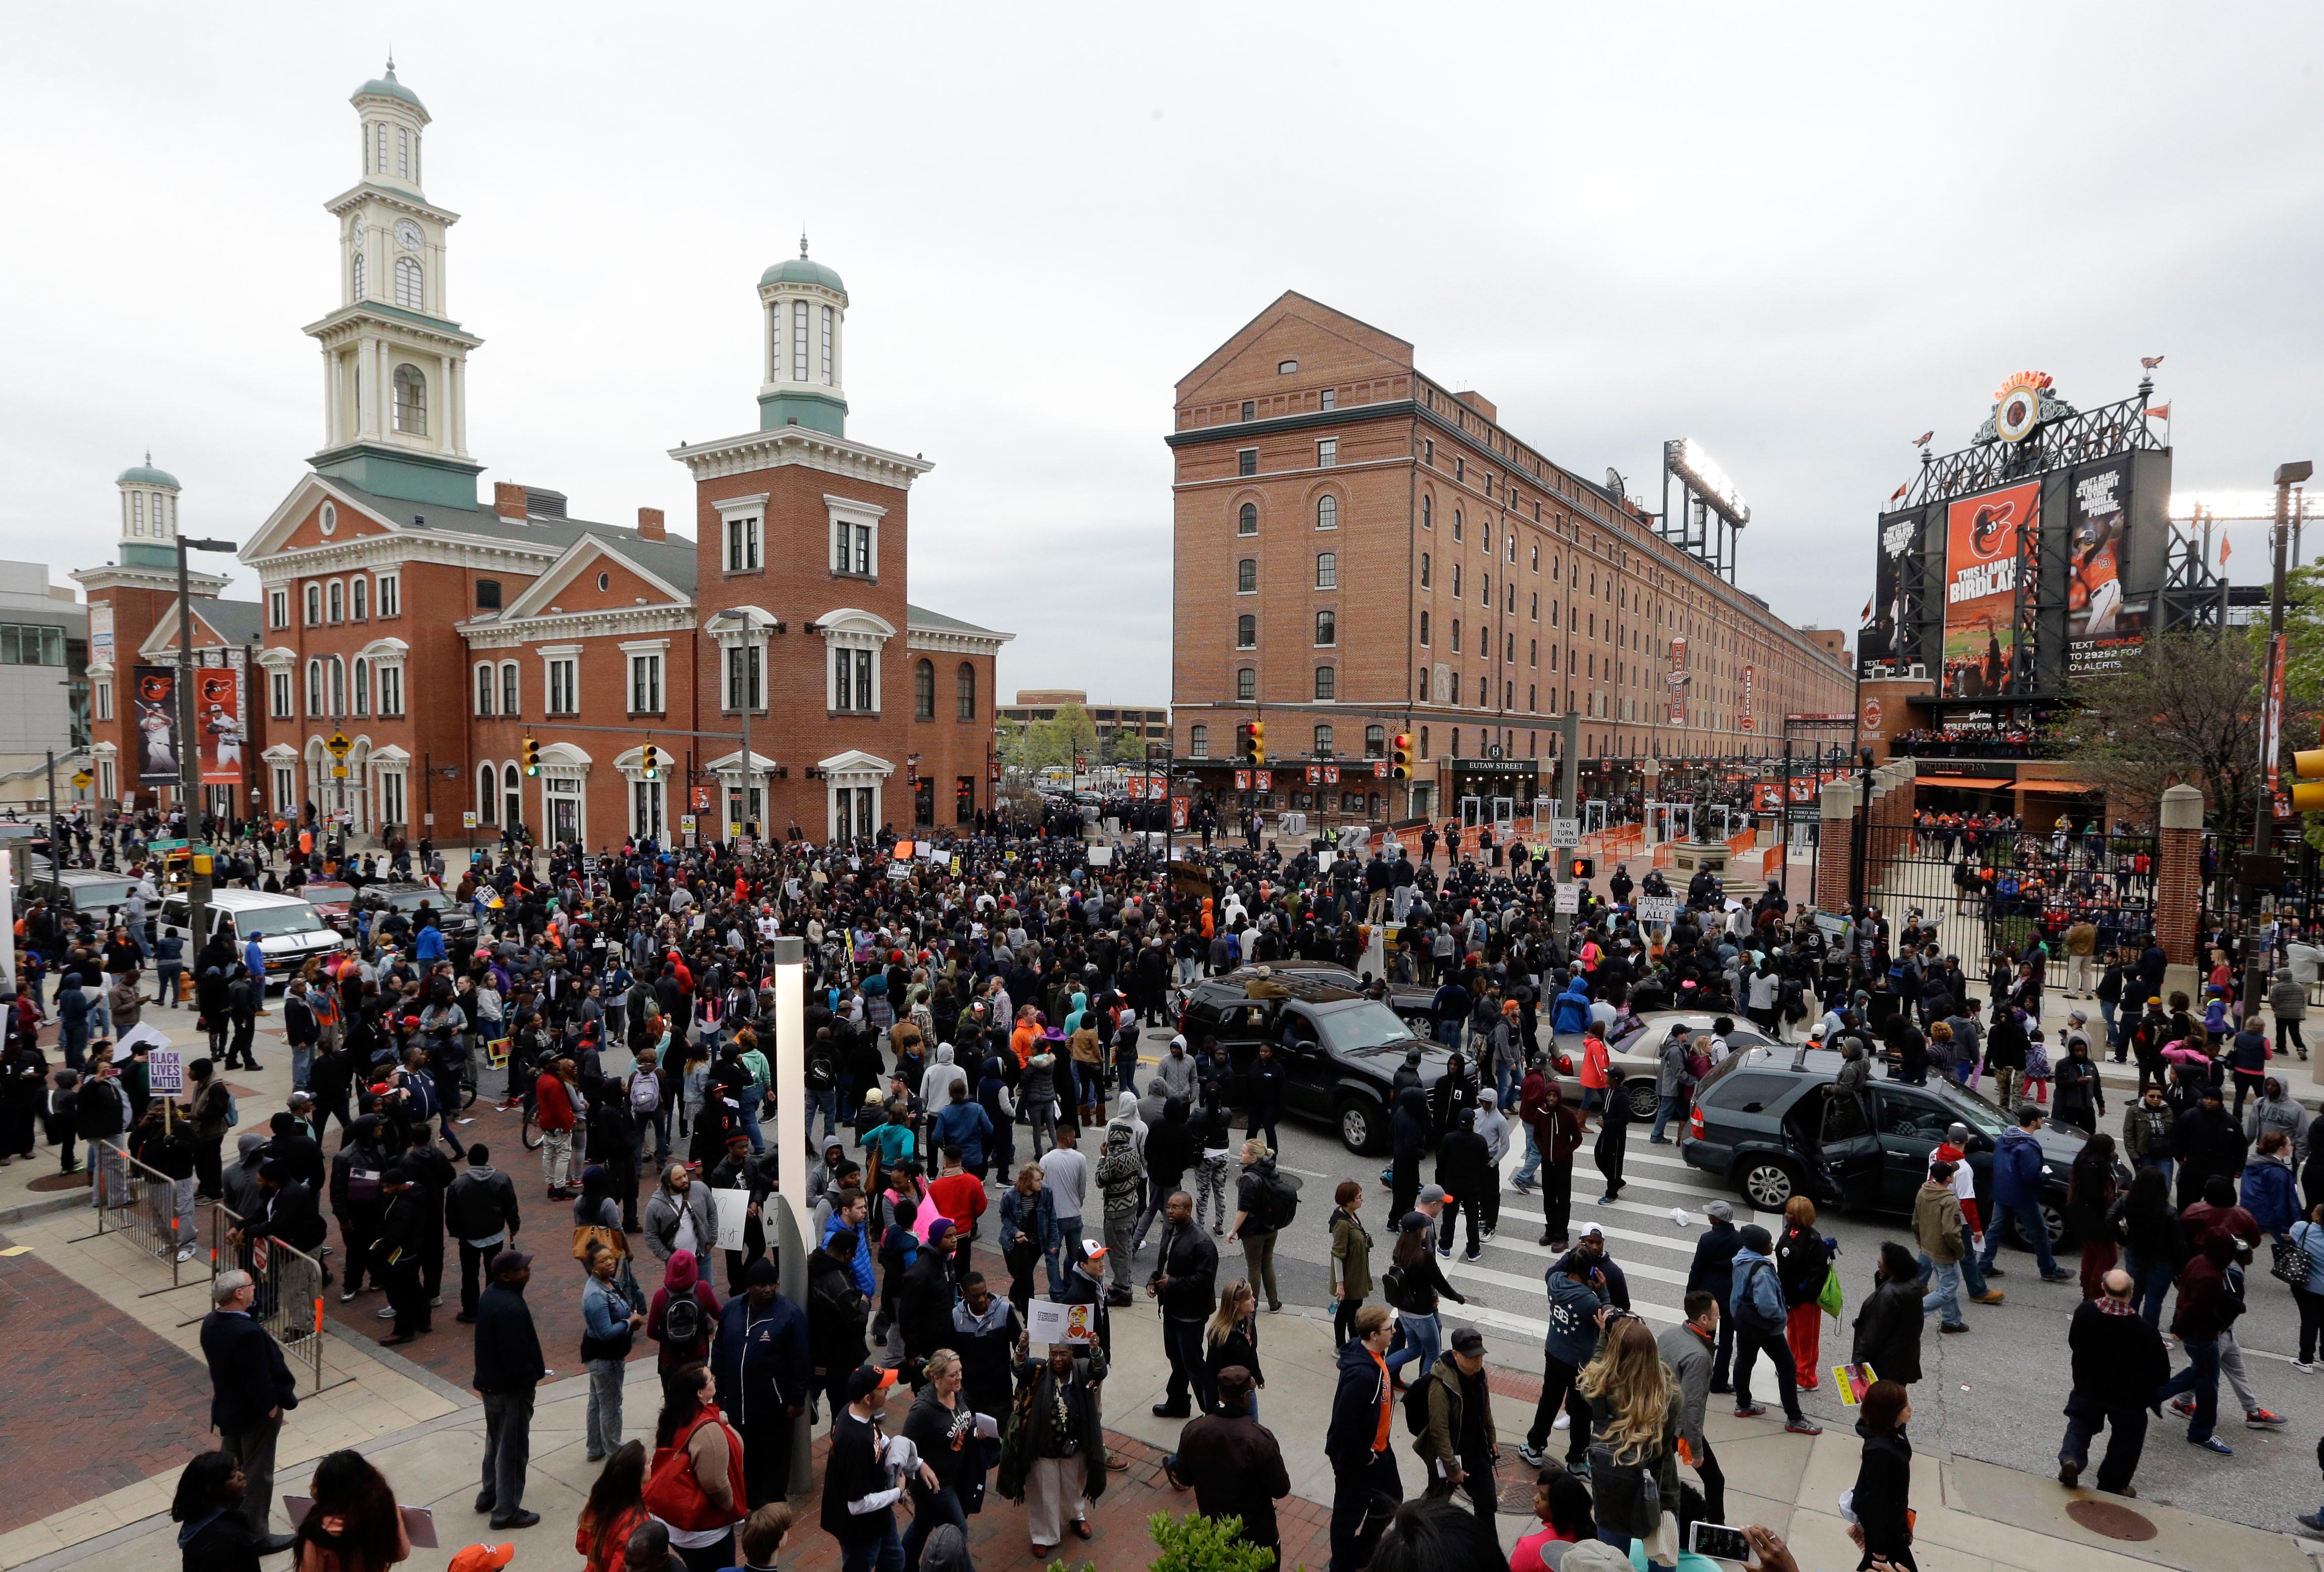 Protestors Baltimore Oriole Park Camden Yards - H 2015